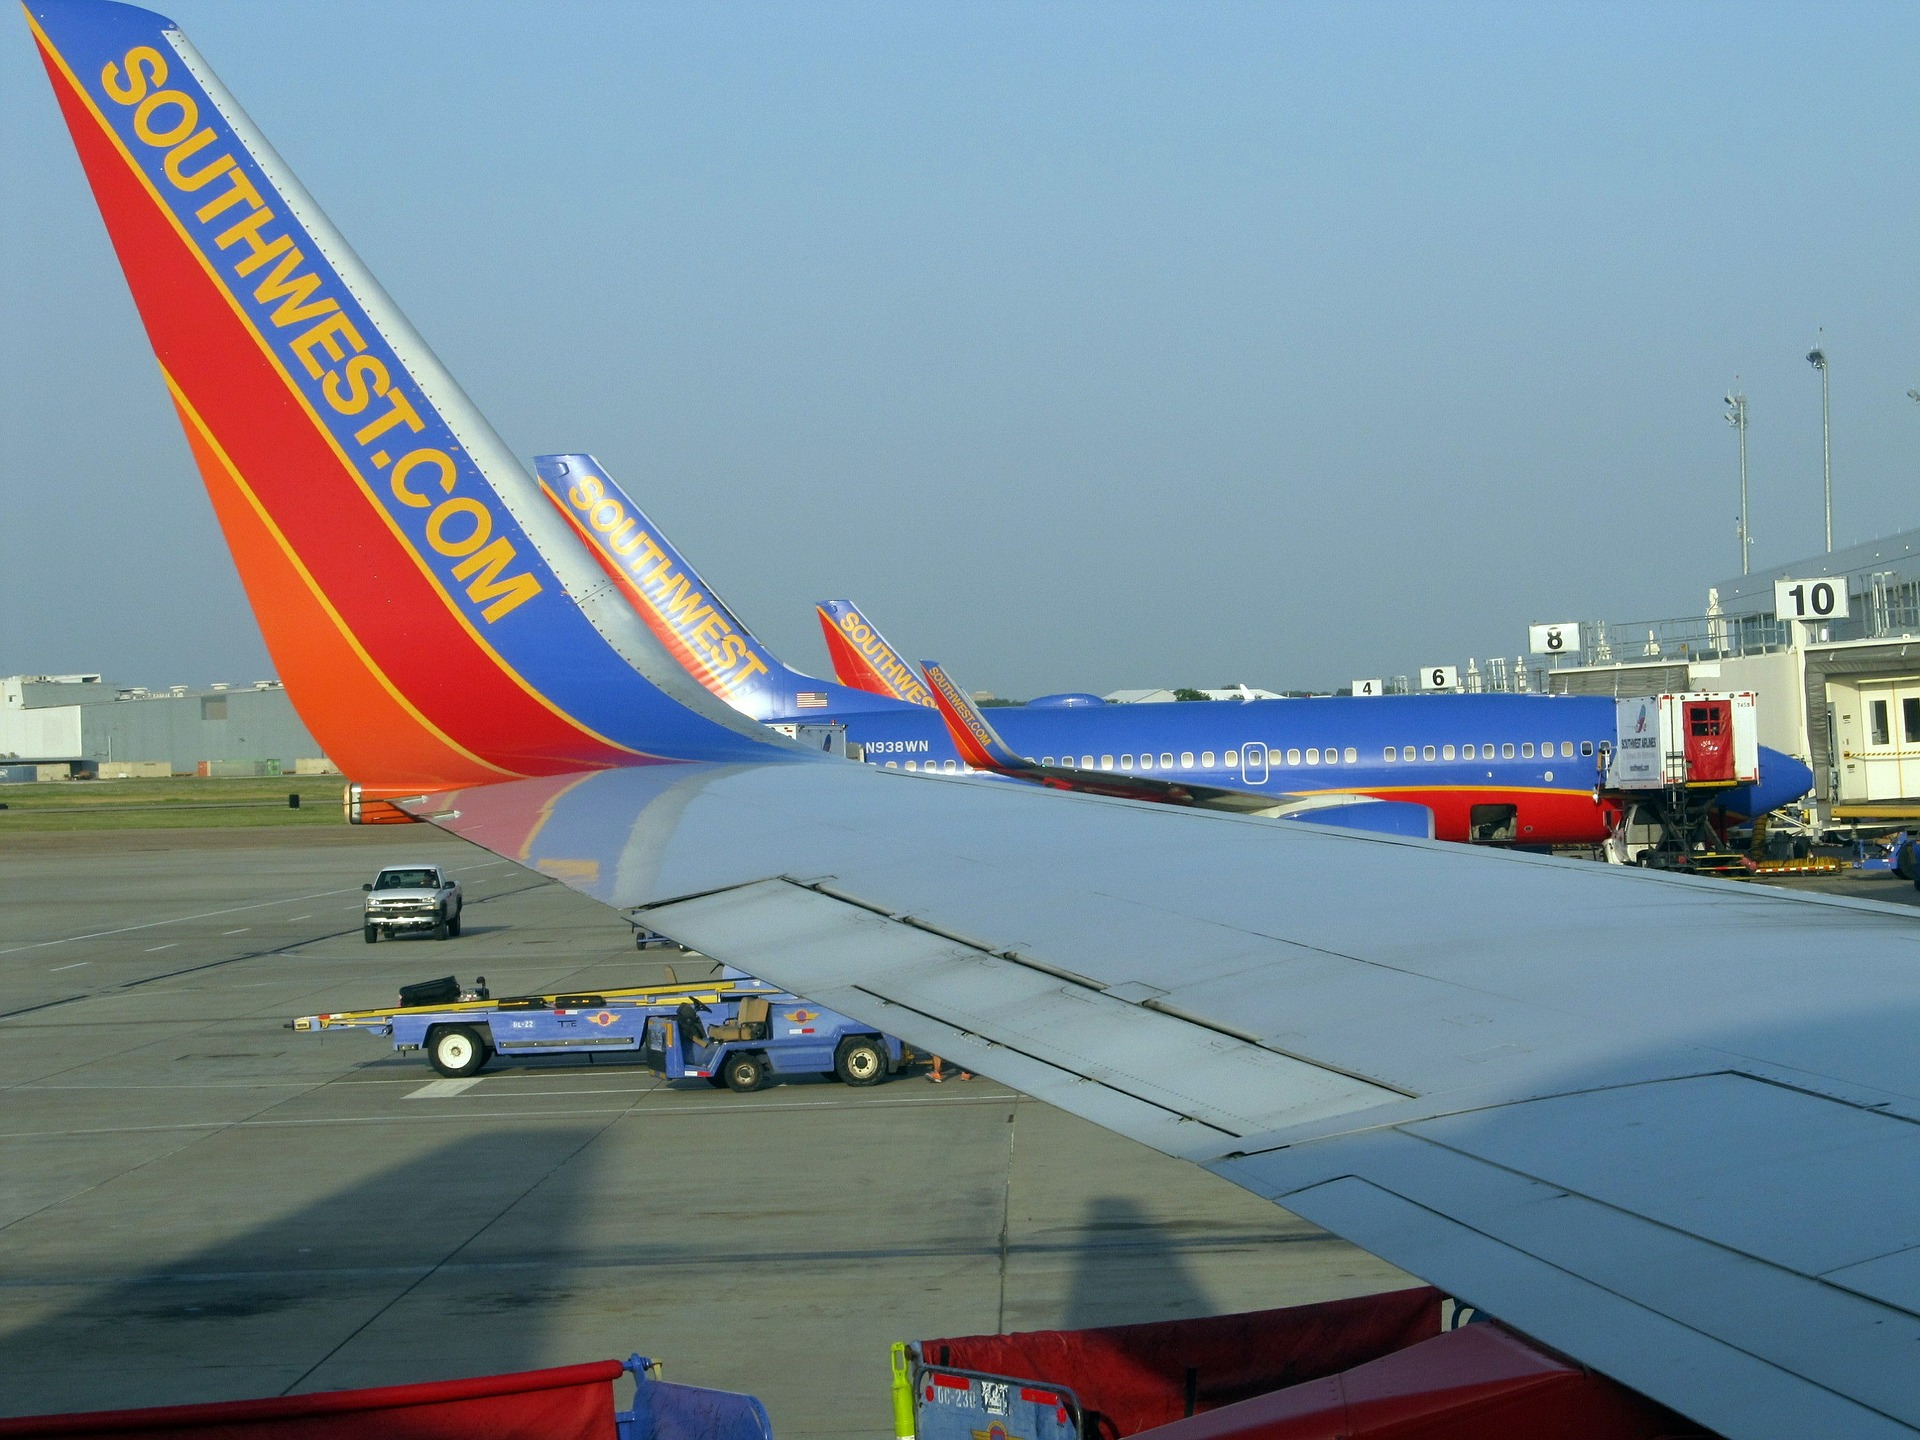 airport-gates-427605_1920.jpg